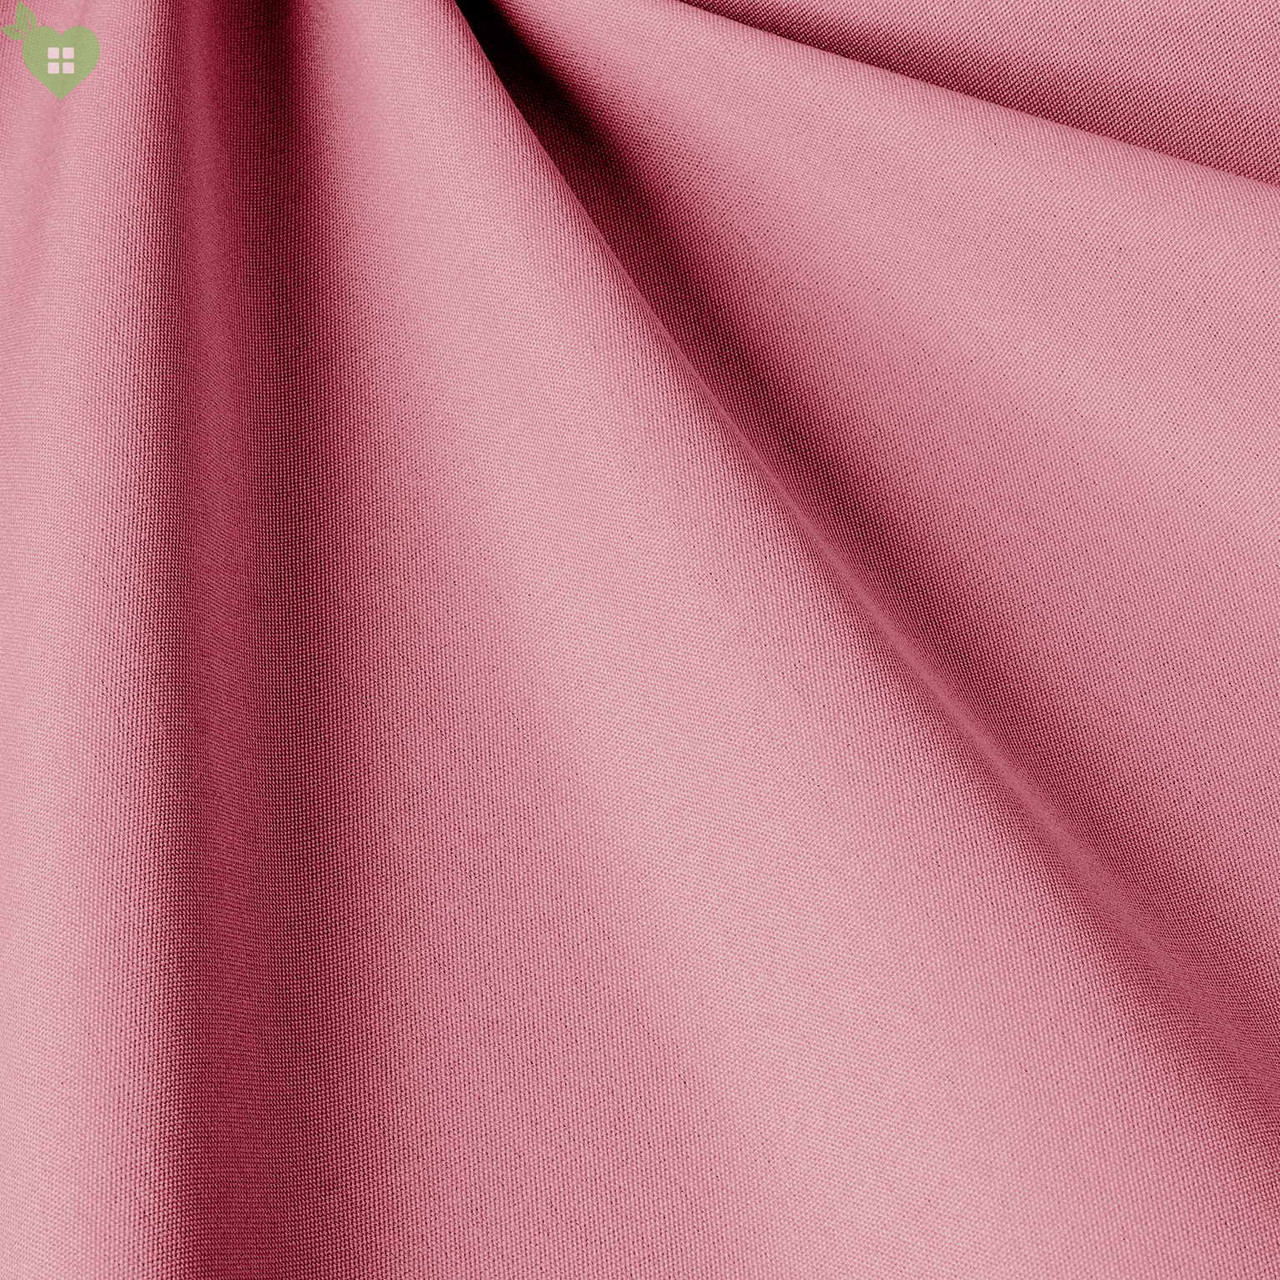 Ткань для улицы: Дралон (Outdoor) 83392v20